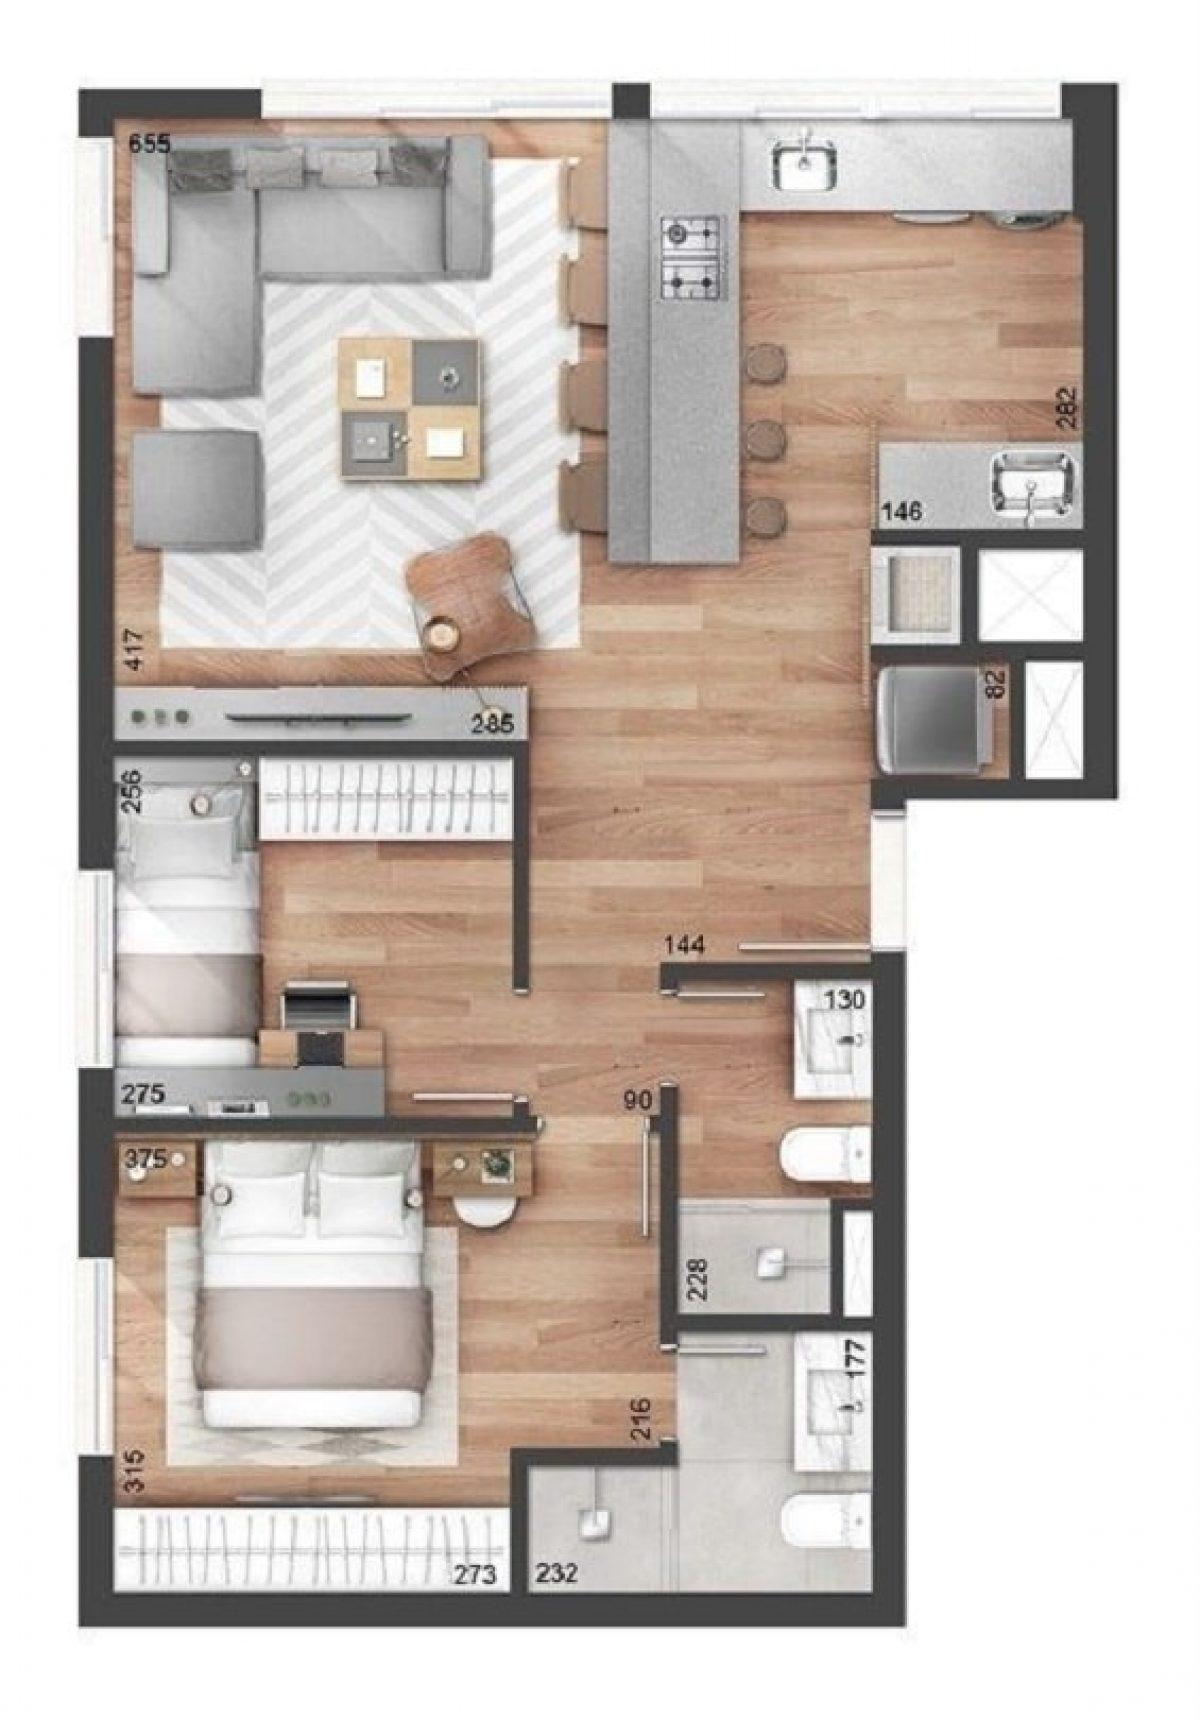 Denah Rumah Minimalis Modern Terbaru 1 Lantai yang Simpel